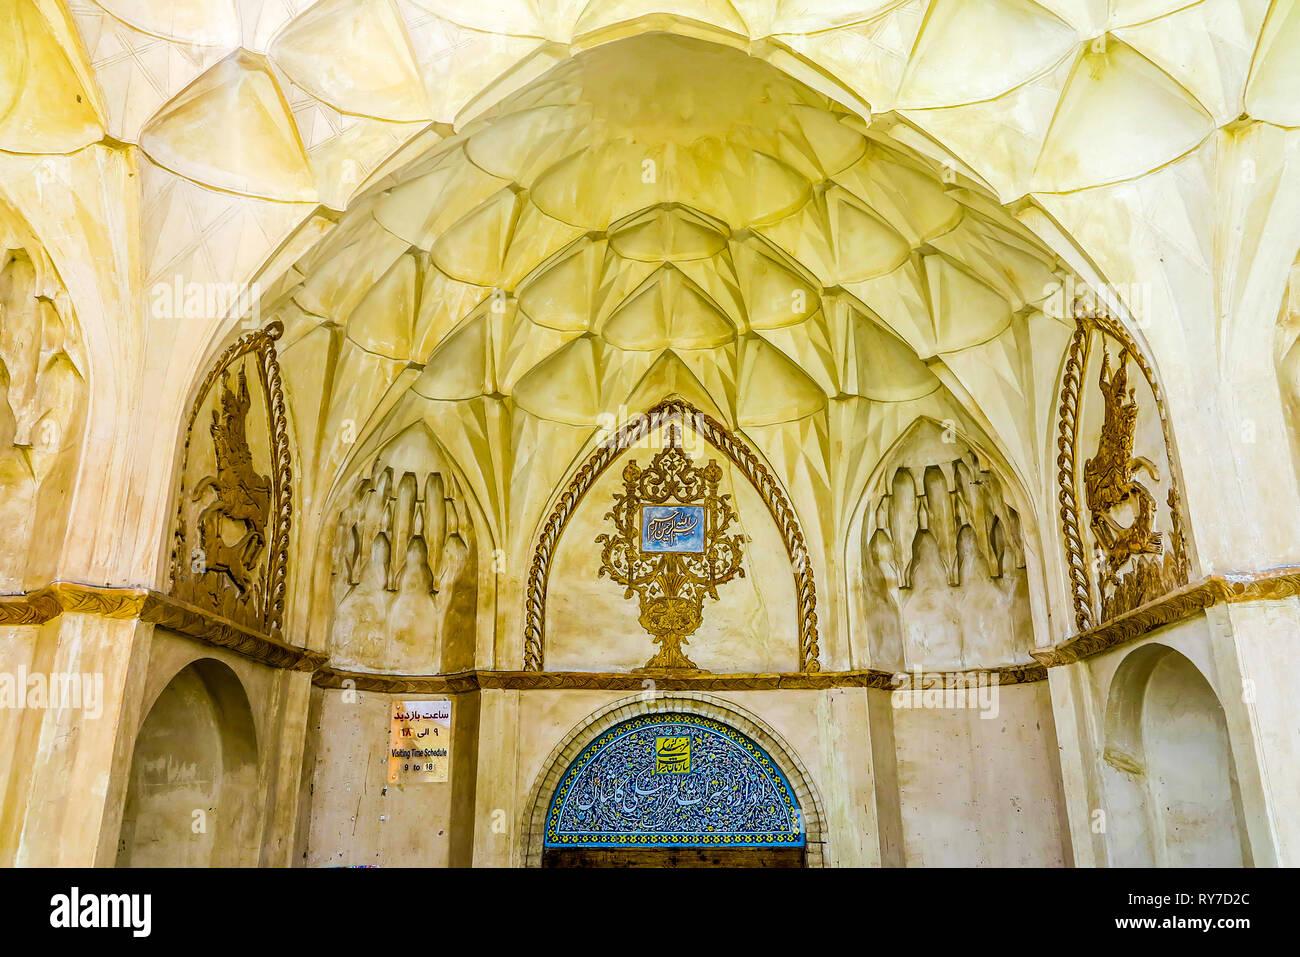 Kashan Boroujerd Historical House Entrance Gate with Muqarna Ahoopay Honeycomb Stalactite Vaulting - Stock Image